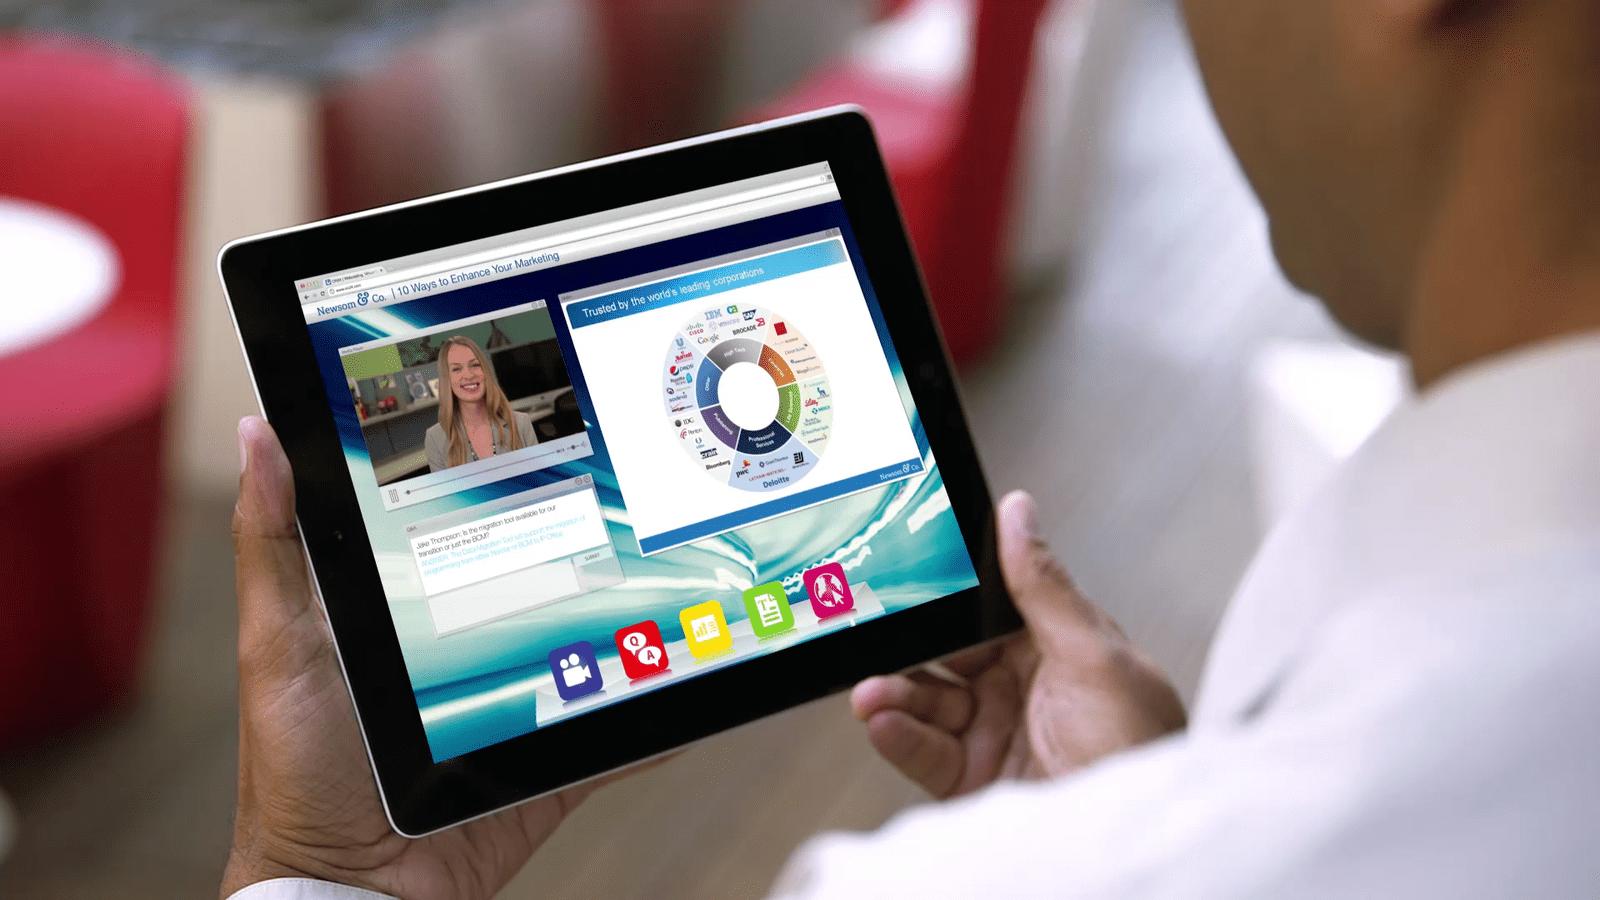 ON24 webcast on tablet grab